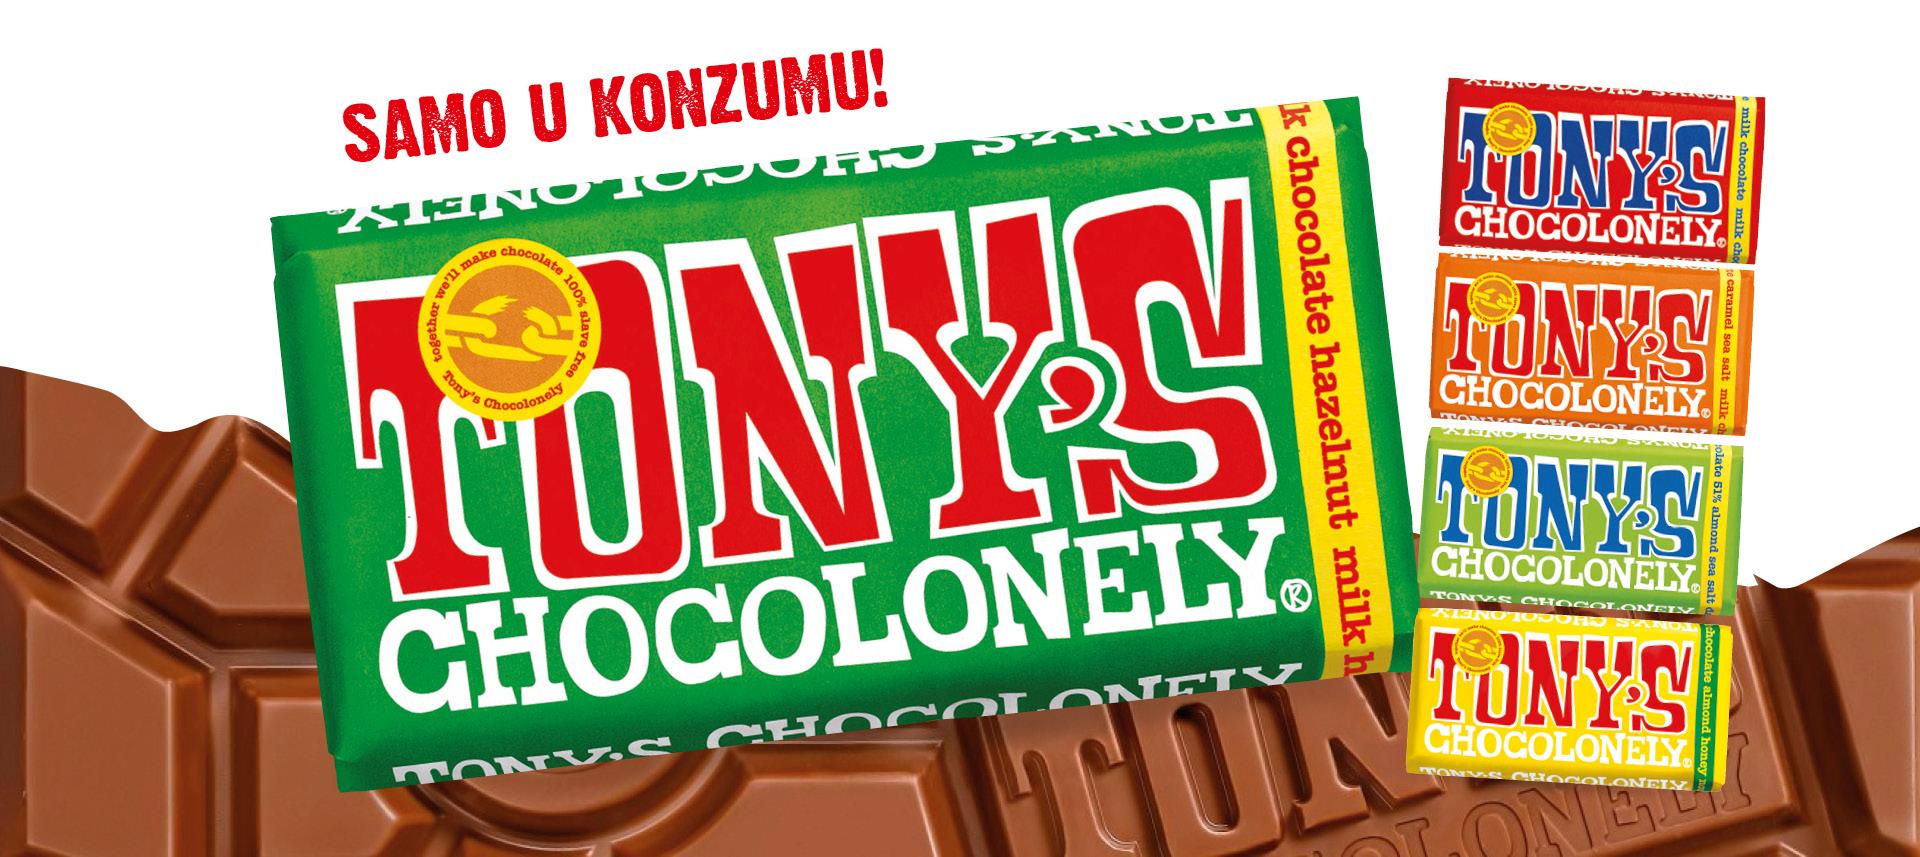 Tonys 1920x857.jpg